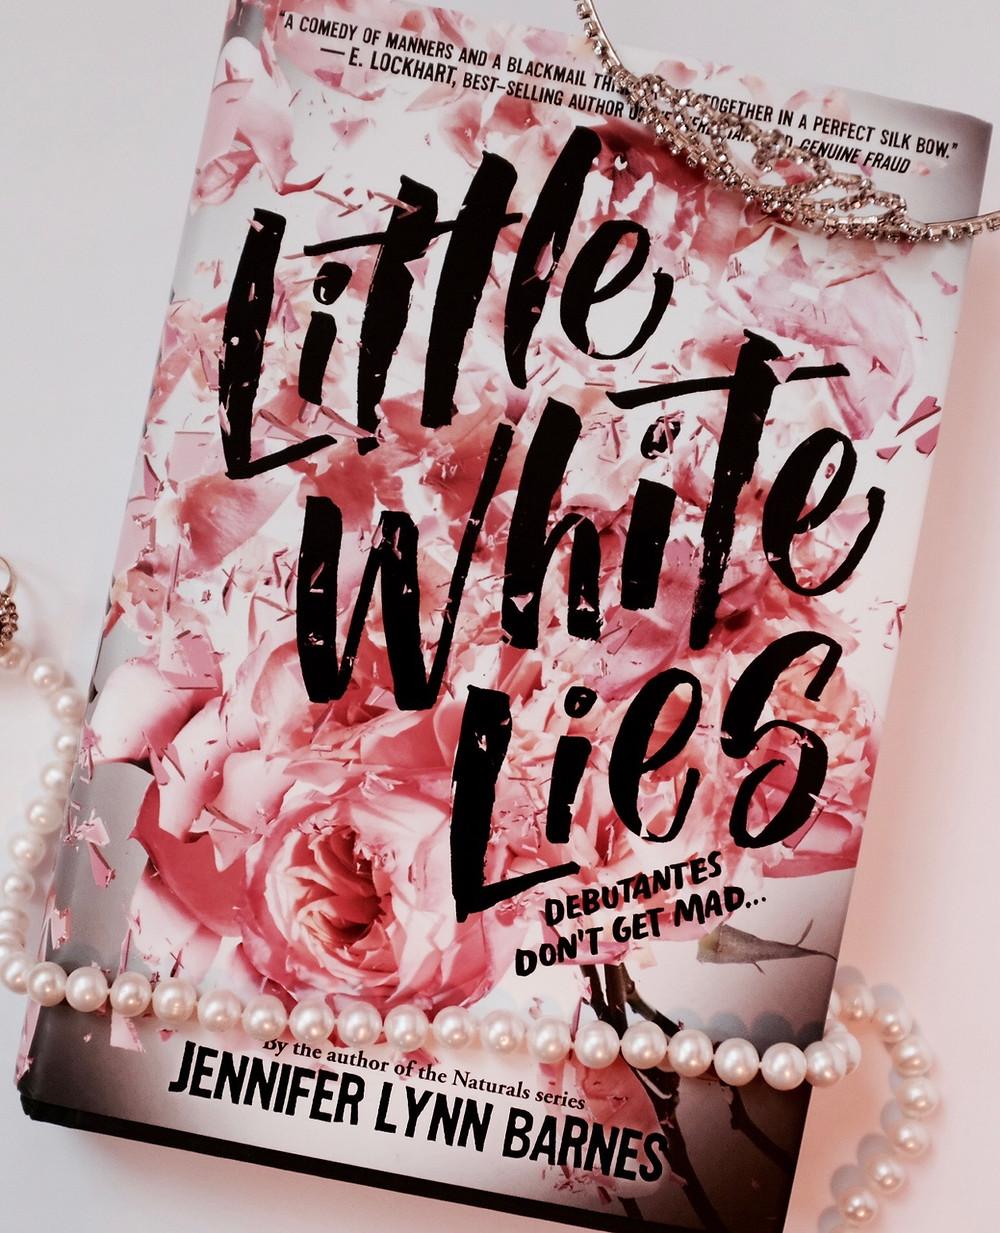 Little-White-Lies-by-Jennifer-Lynn-Barnes